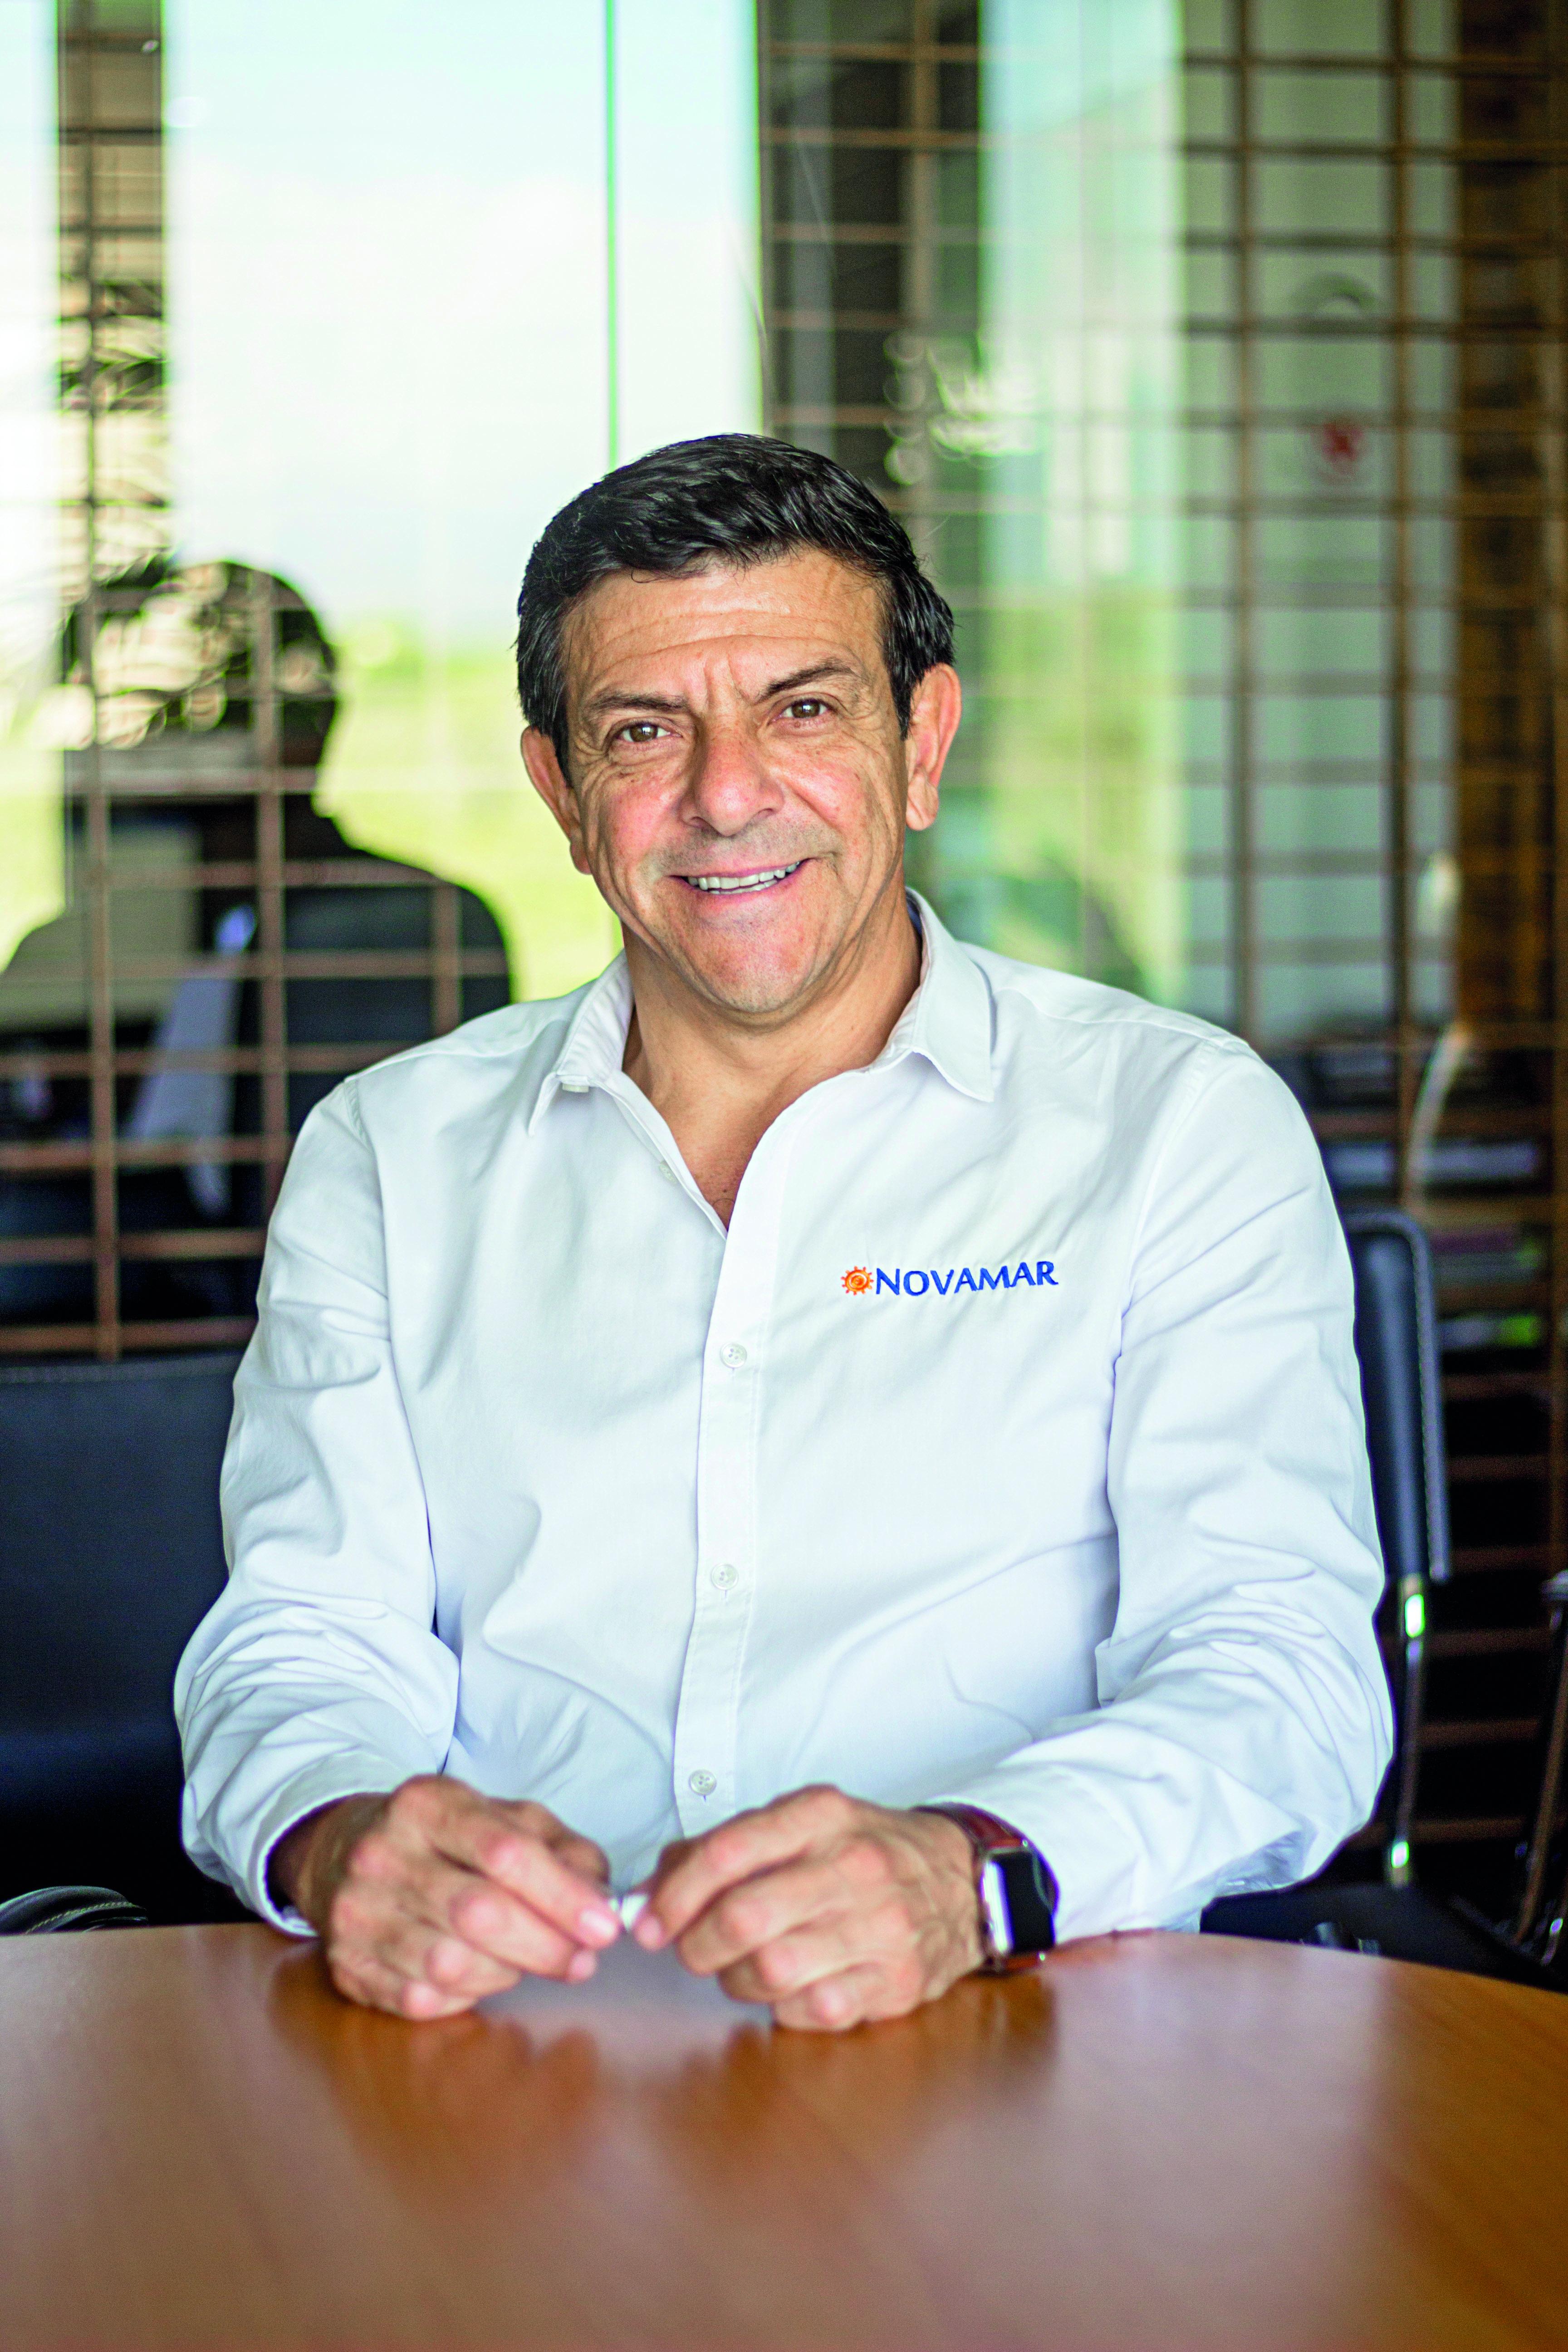 Roberto Castellanos Omaña, international general director of Novamar Insurance Mexico